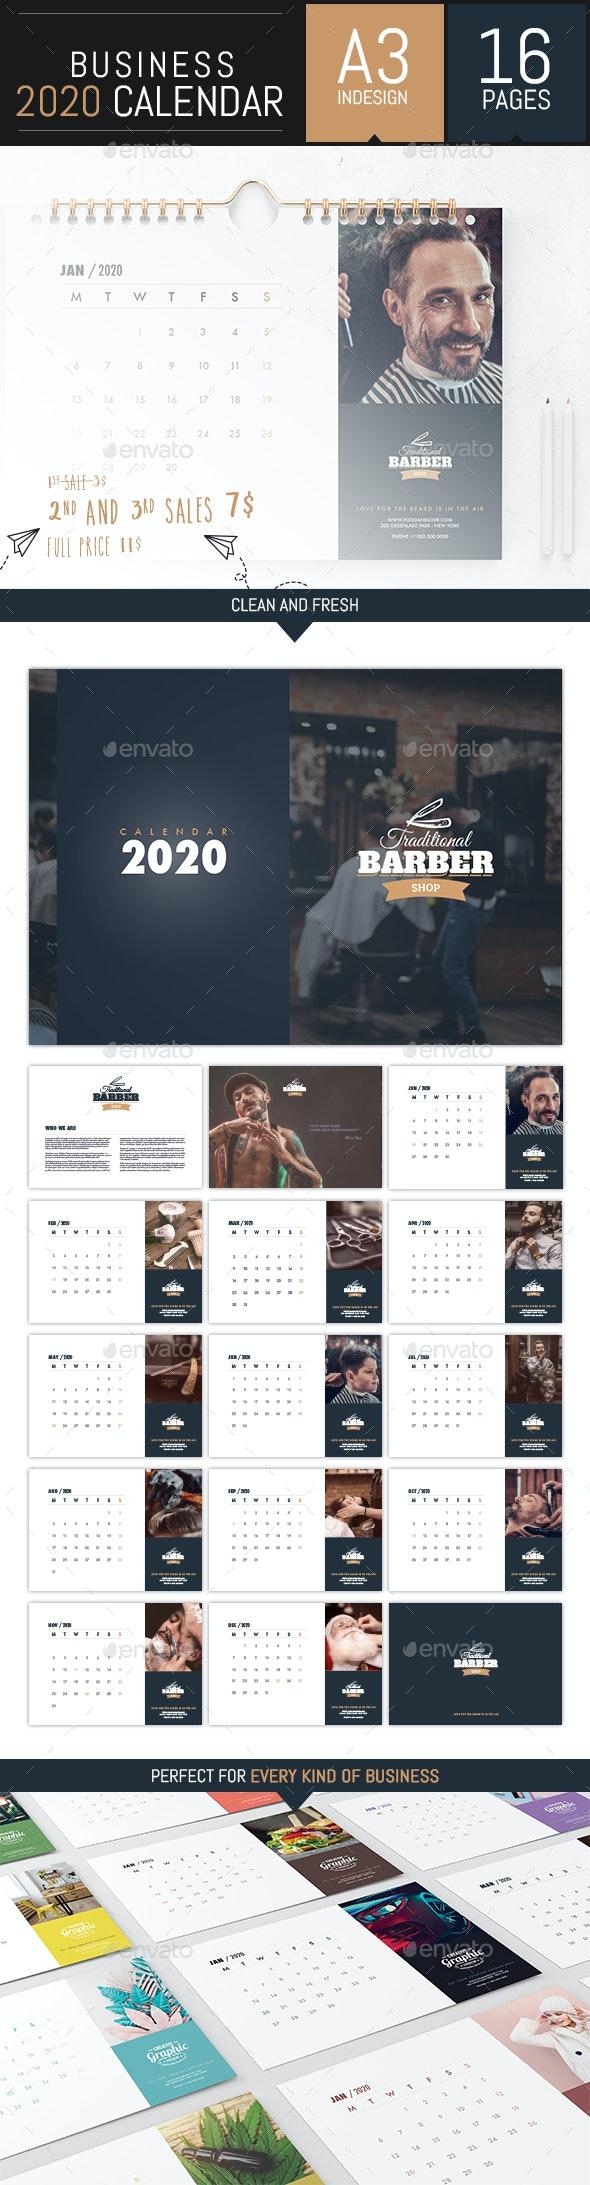 Business Calendar 2020 Template - InDesign - Calendars Stationery